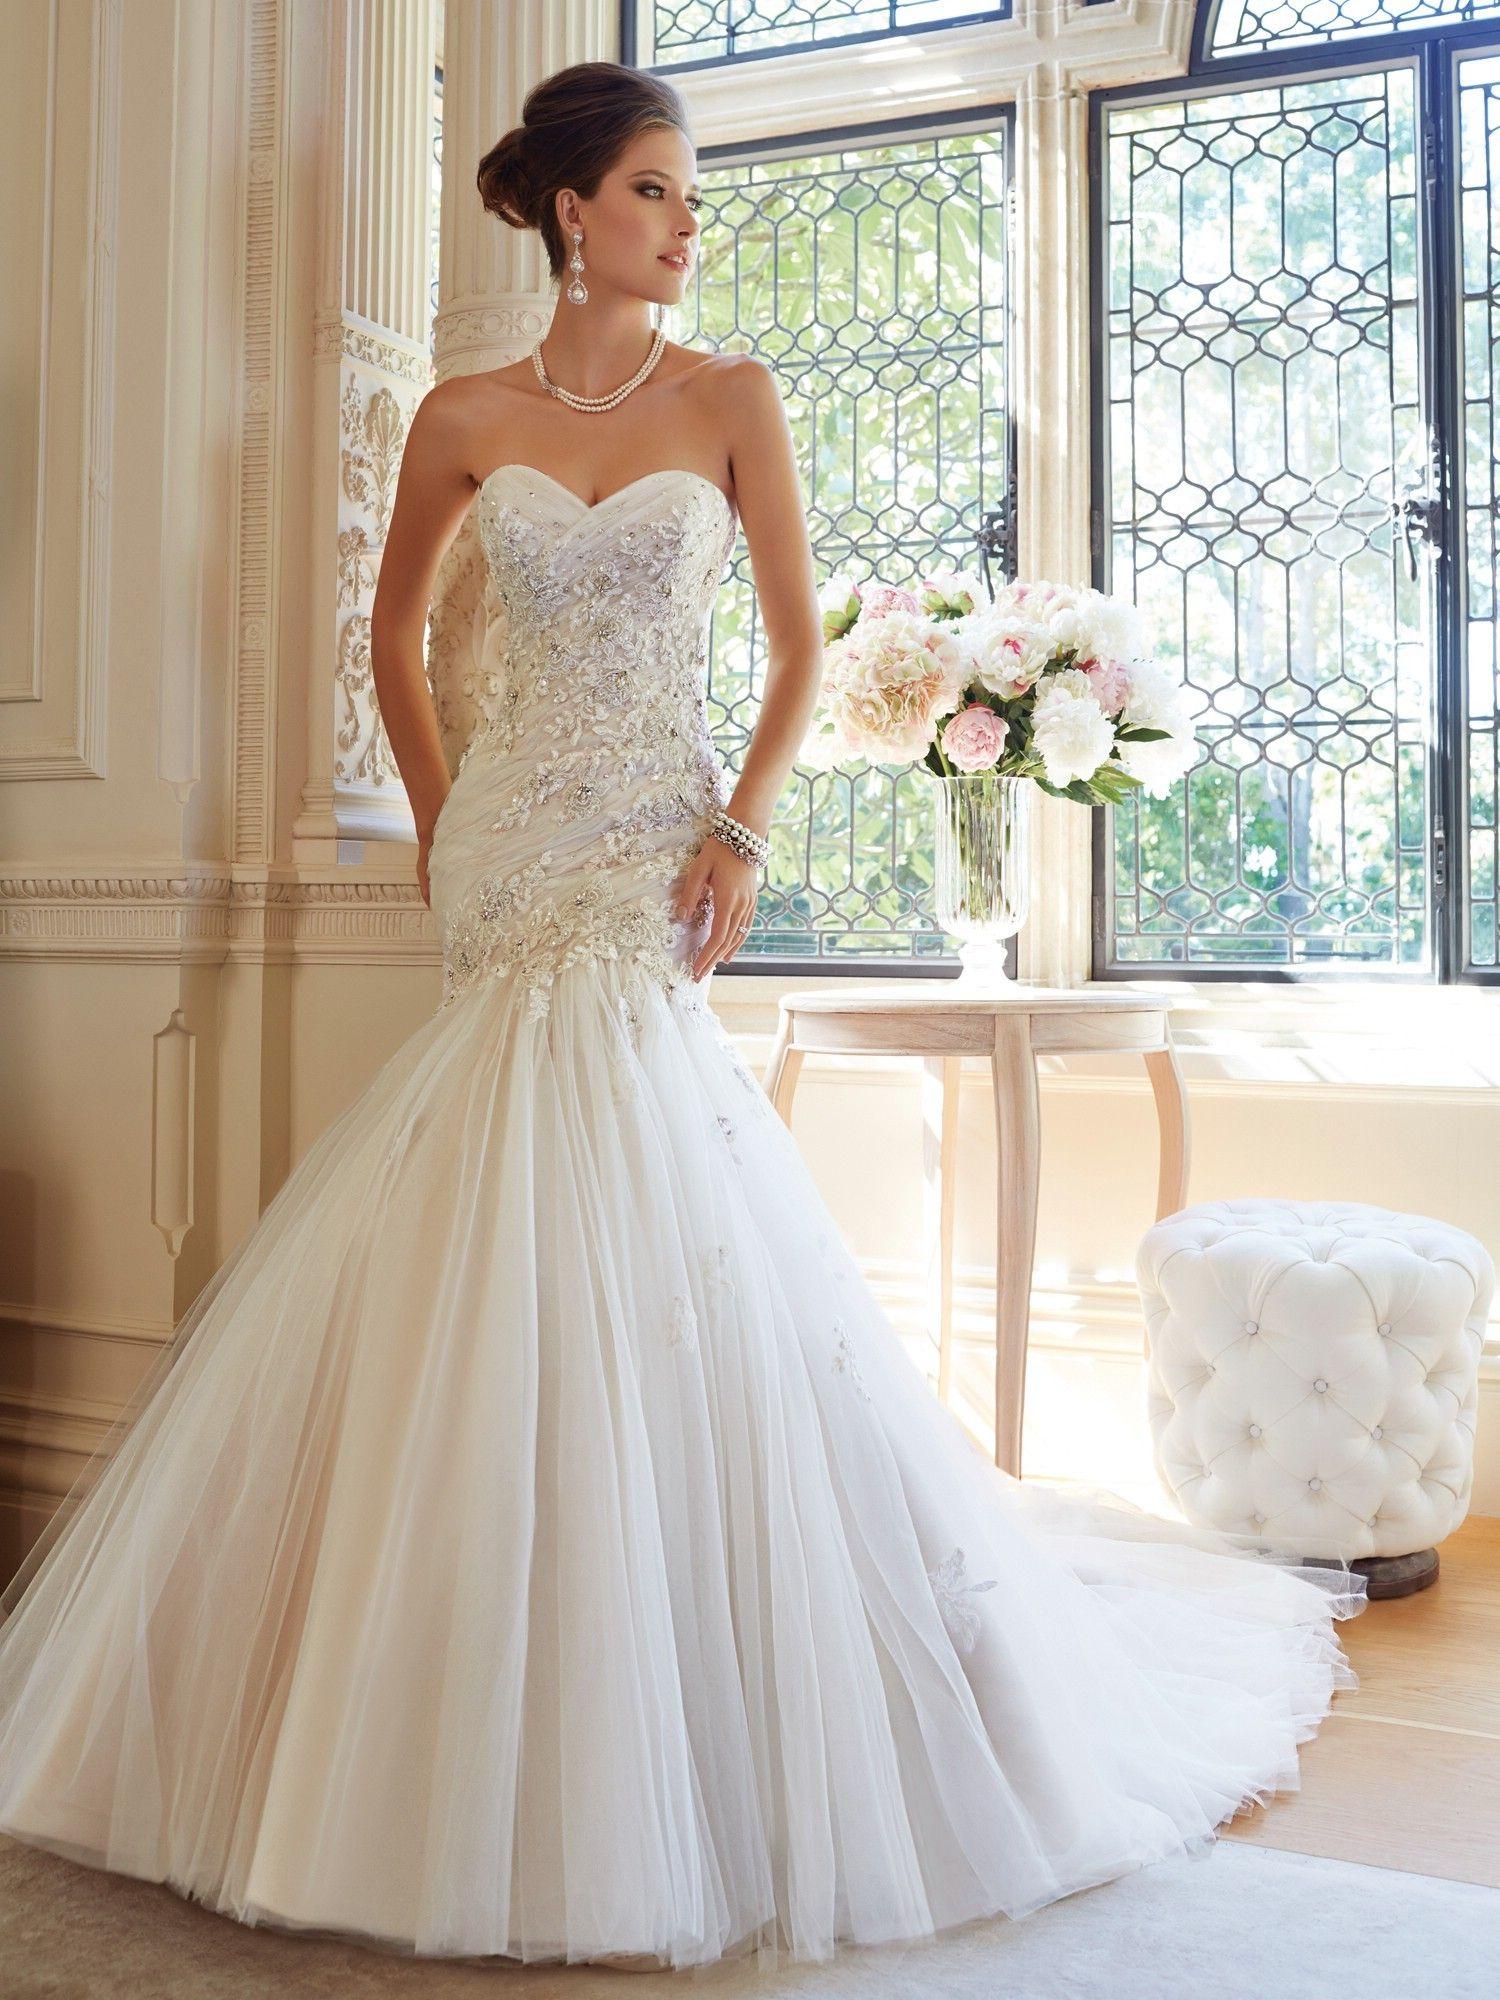 Sophia Tolli Wedding Dresses Style Tilda Y21448 1 573 00